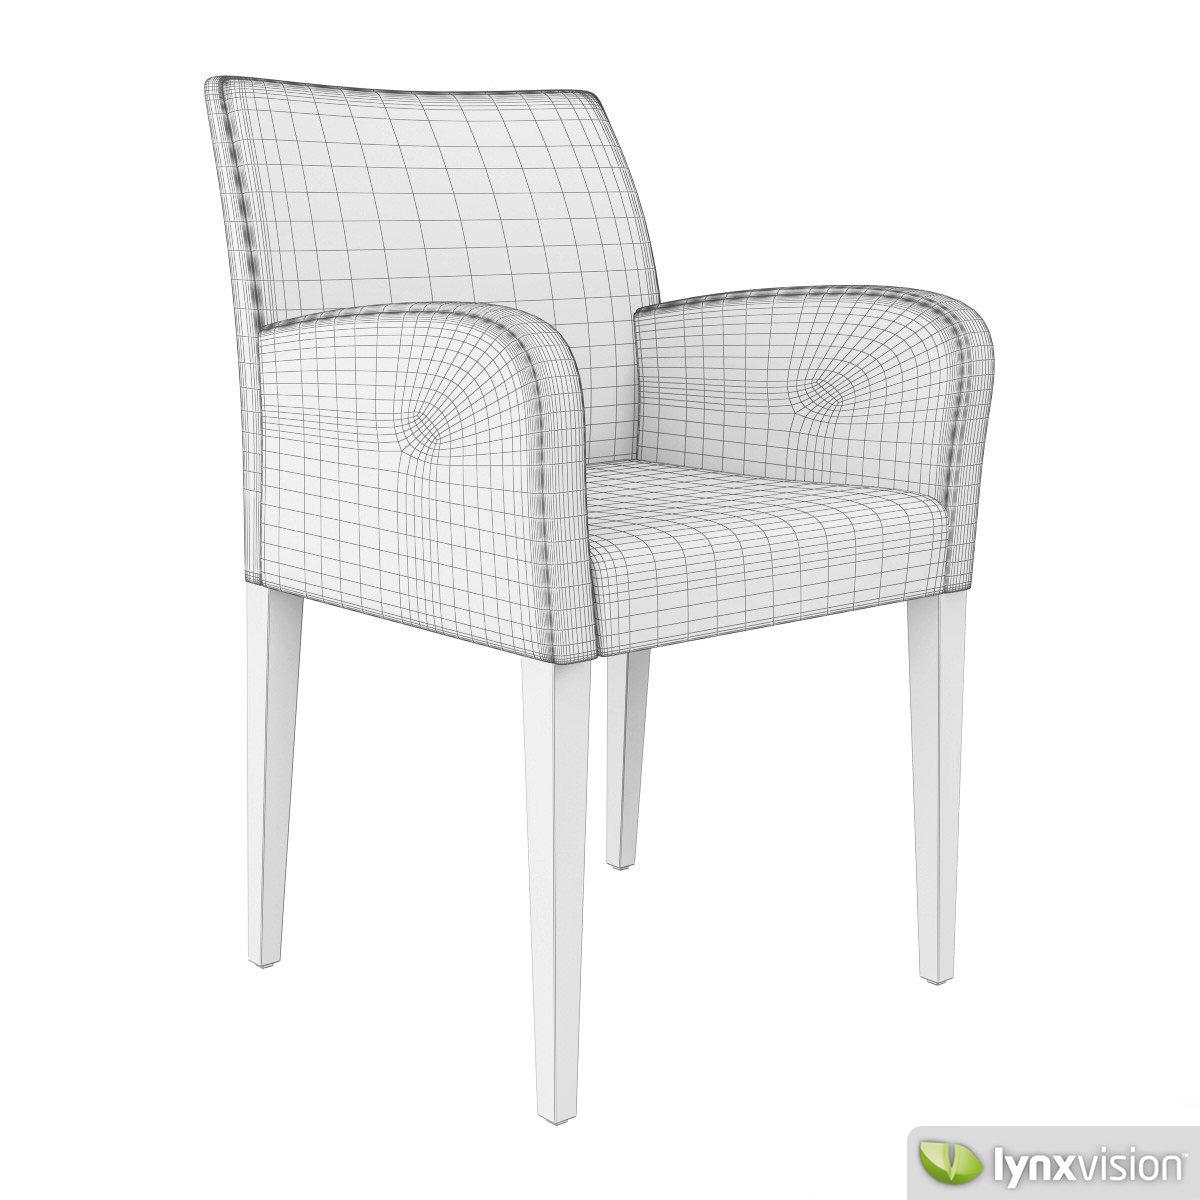 Liz chair by poltrona frau 3d model max obj fbx mtl for Poltrona 3d